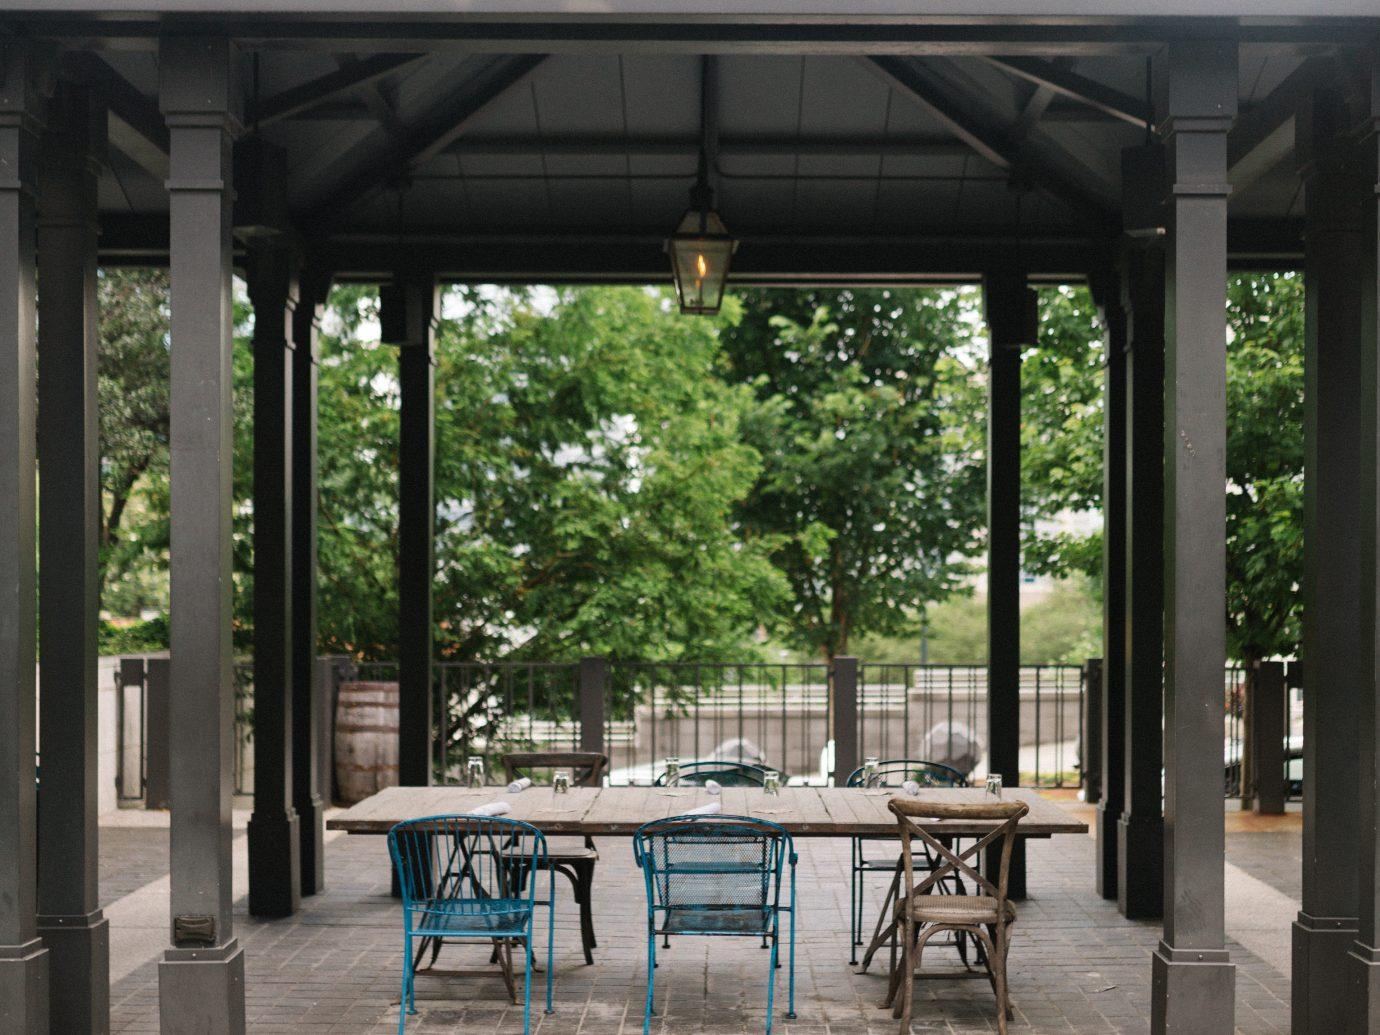 Bocce ball patio space